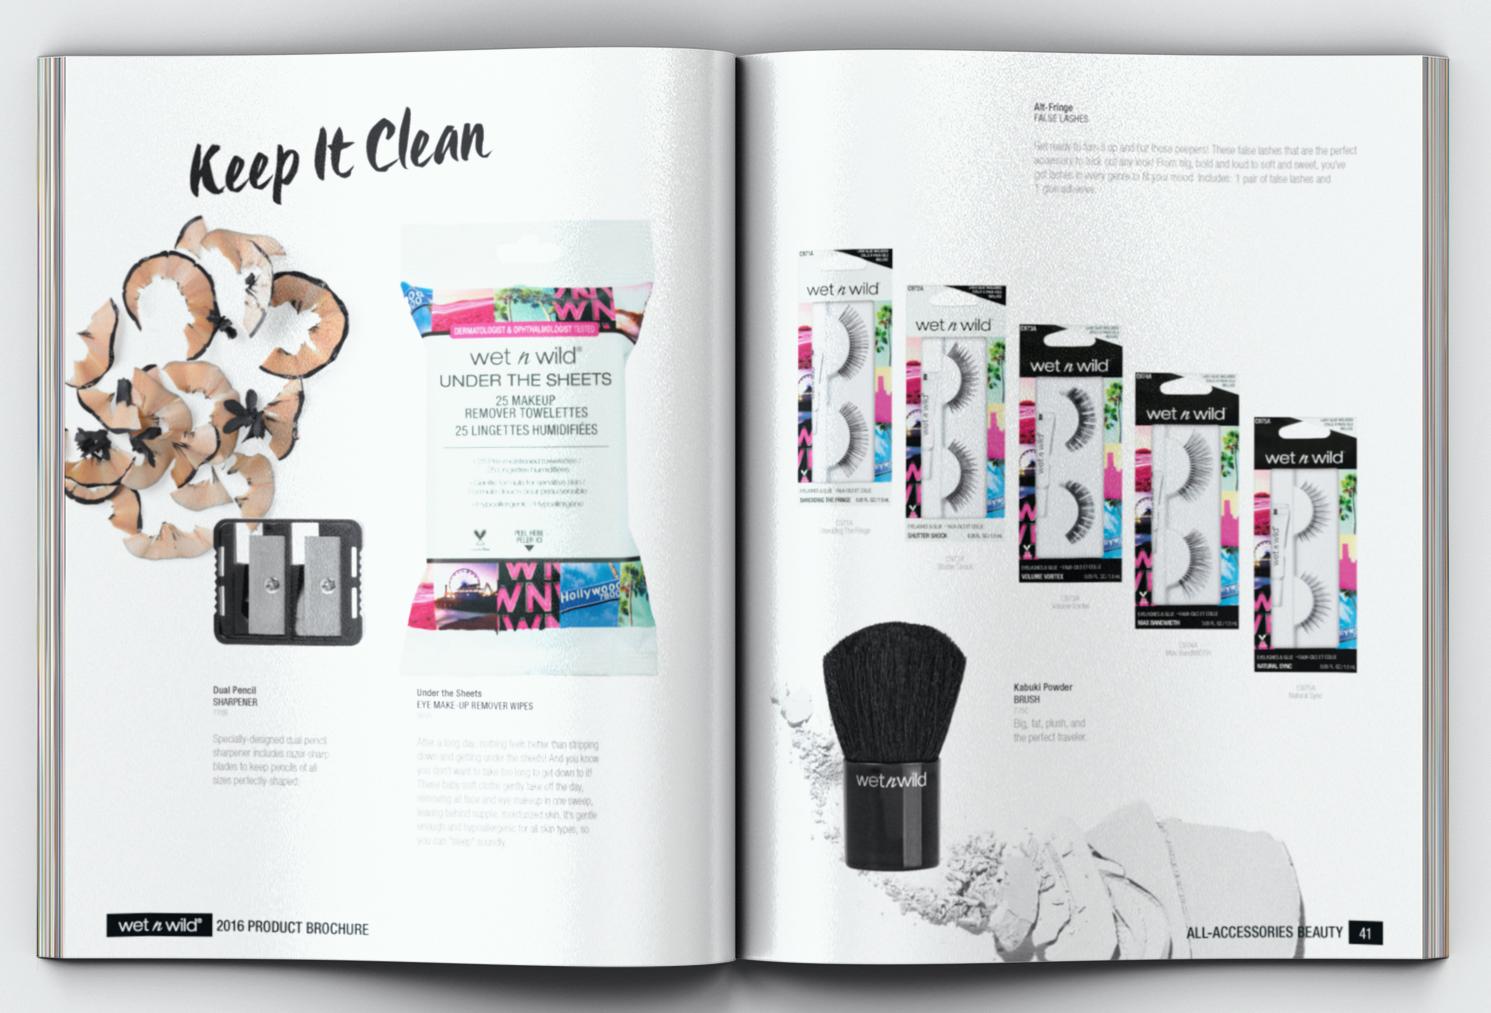 Natl_Product_Brochure_21.jpg